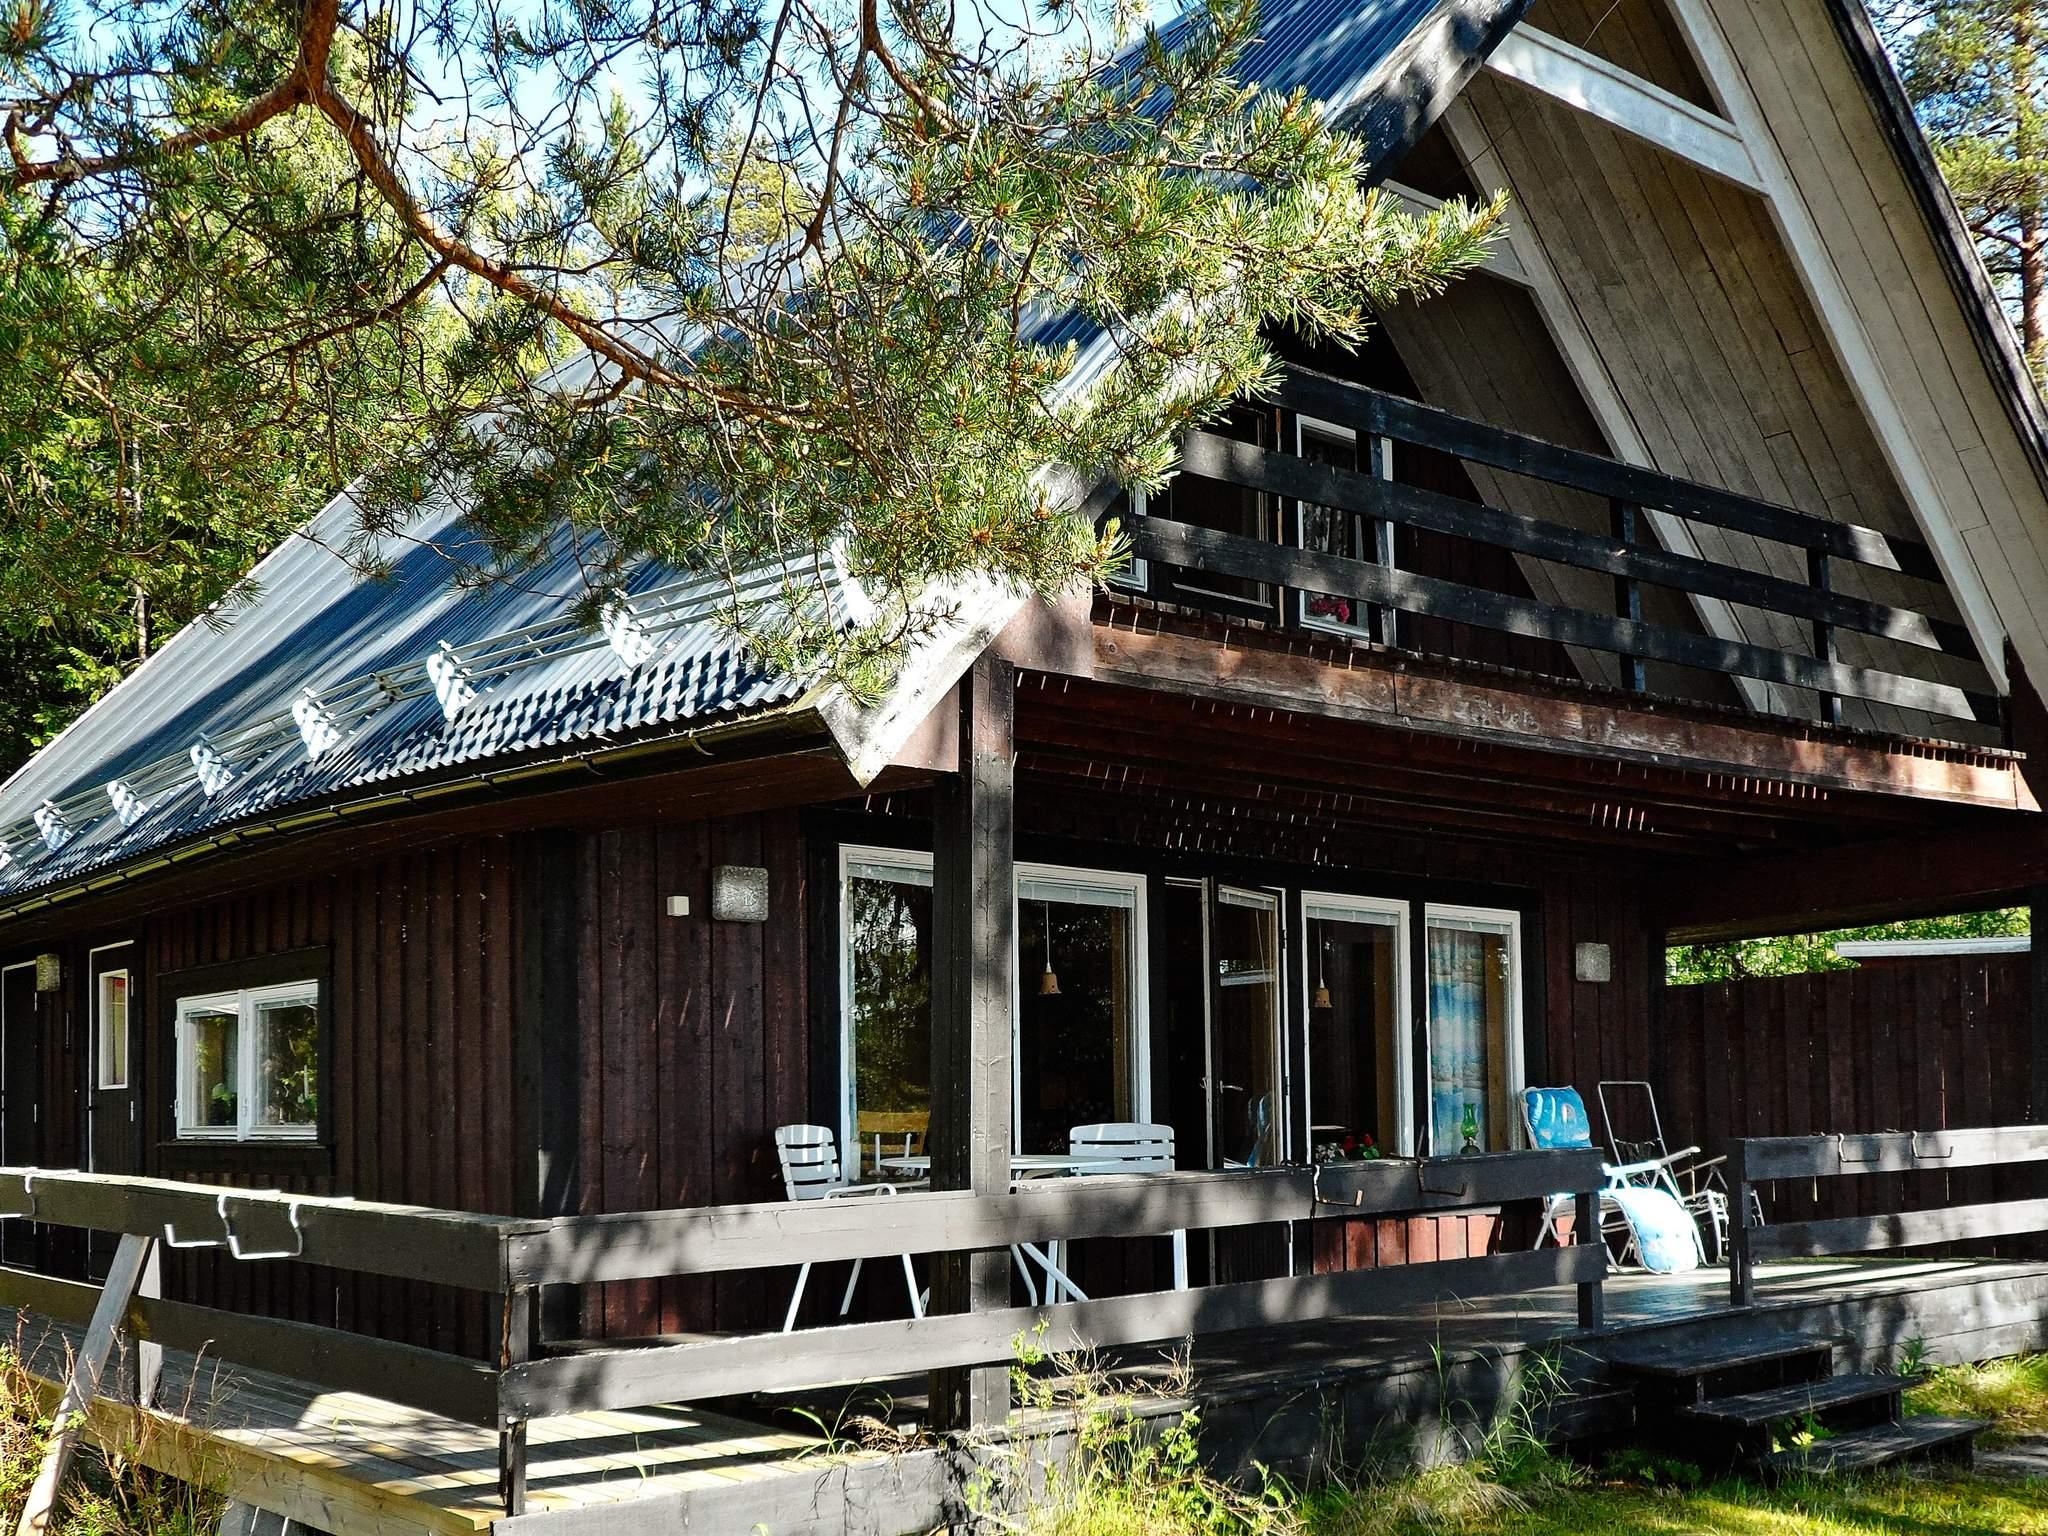 Ferienhaus Nordmaling (1026050), Lögdeå, Västerbottens län, Nordschweden, Schweden, Bild 11